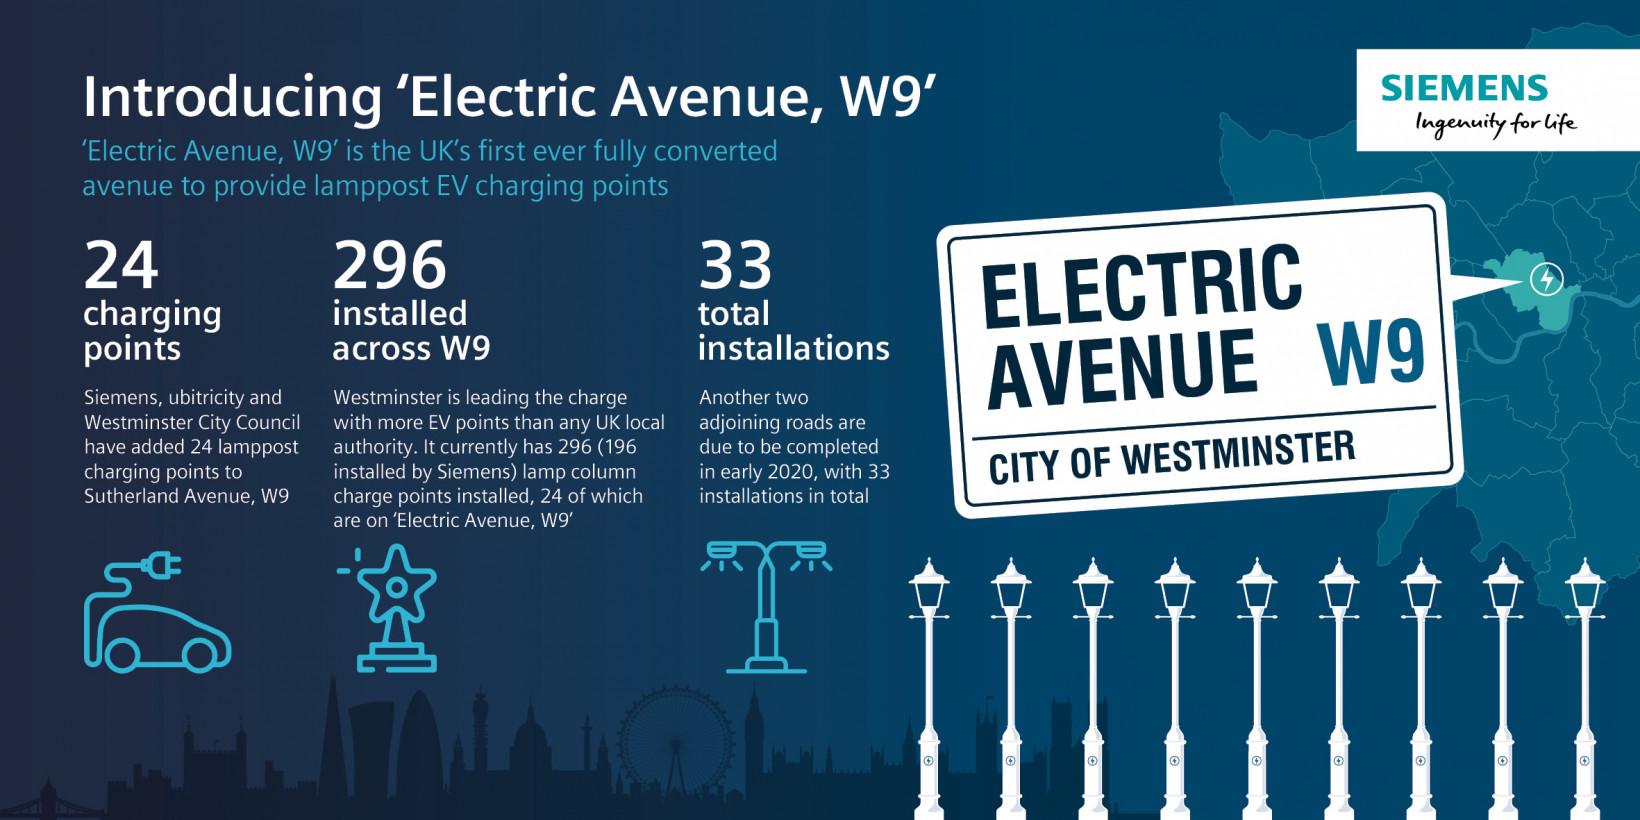 Siemens, ubricity, westminster, ev, charging, lamppost